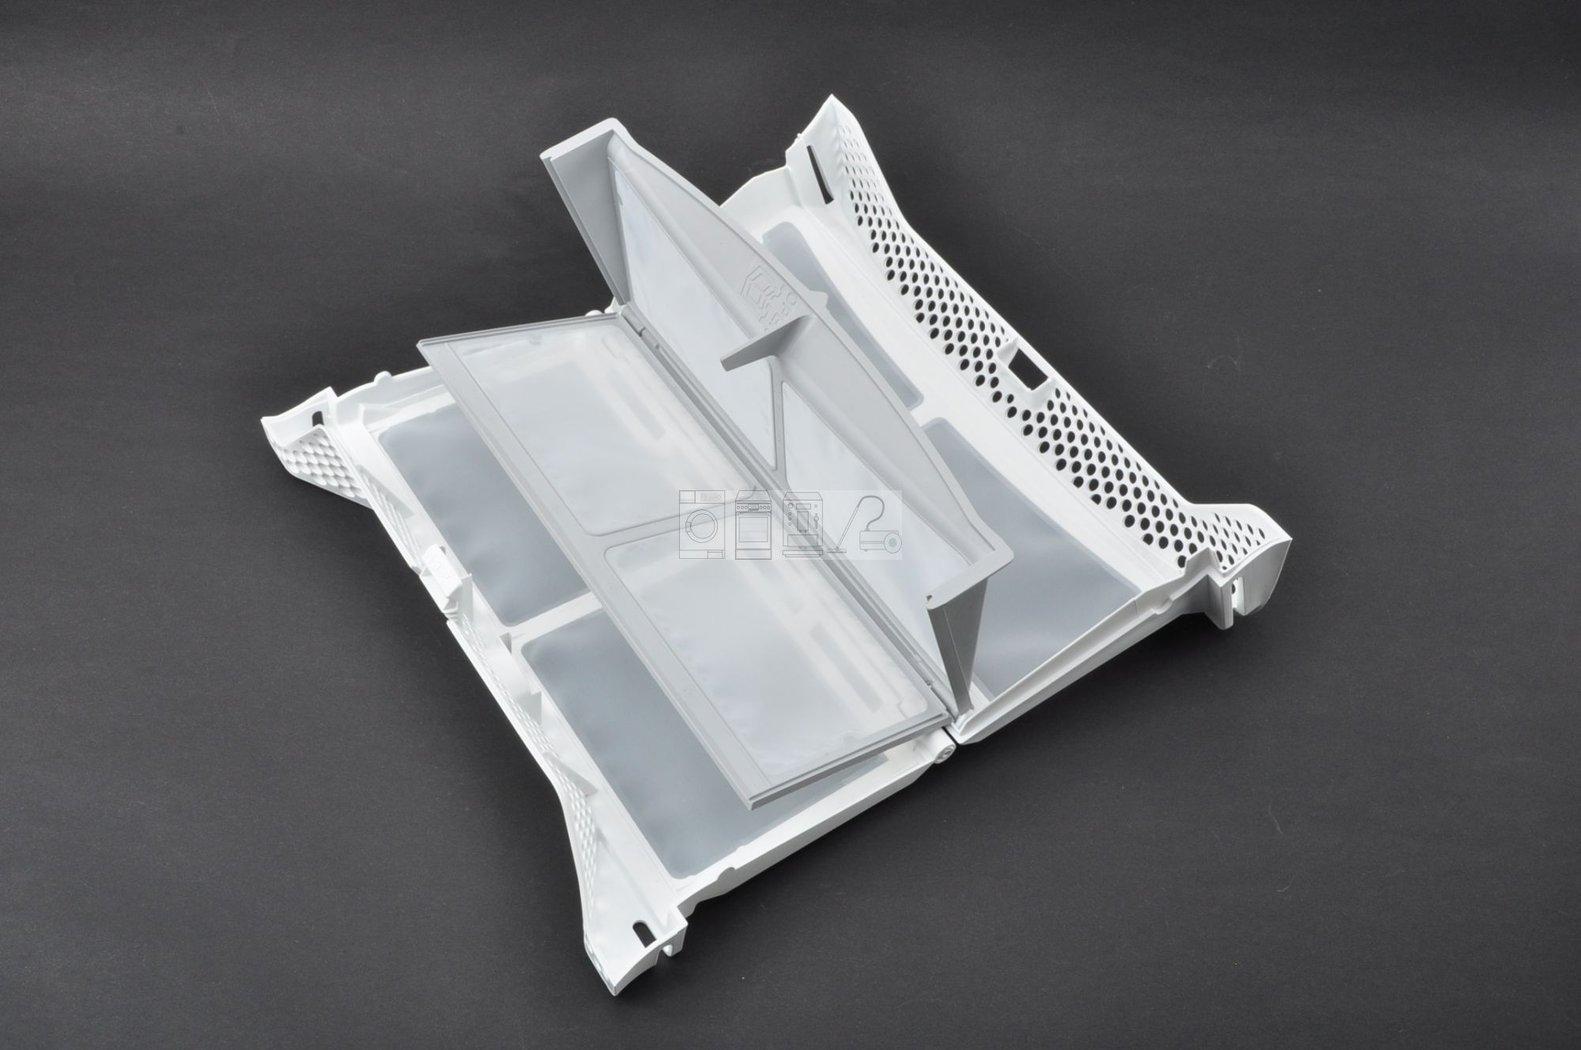 aeg flusensieb w schetrockner electrolux lavatherm 8074539019. Black Bedroom Furniture Sets. Home Design Ideas